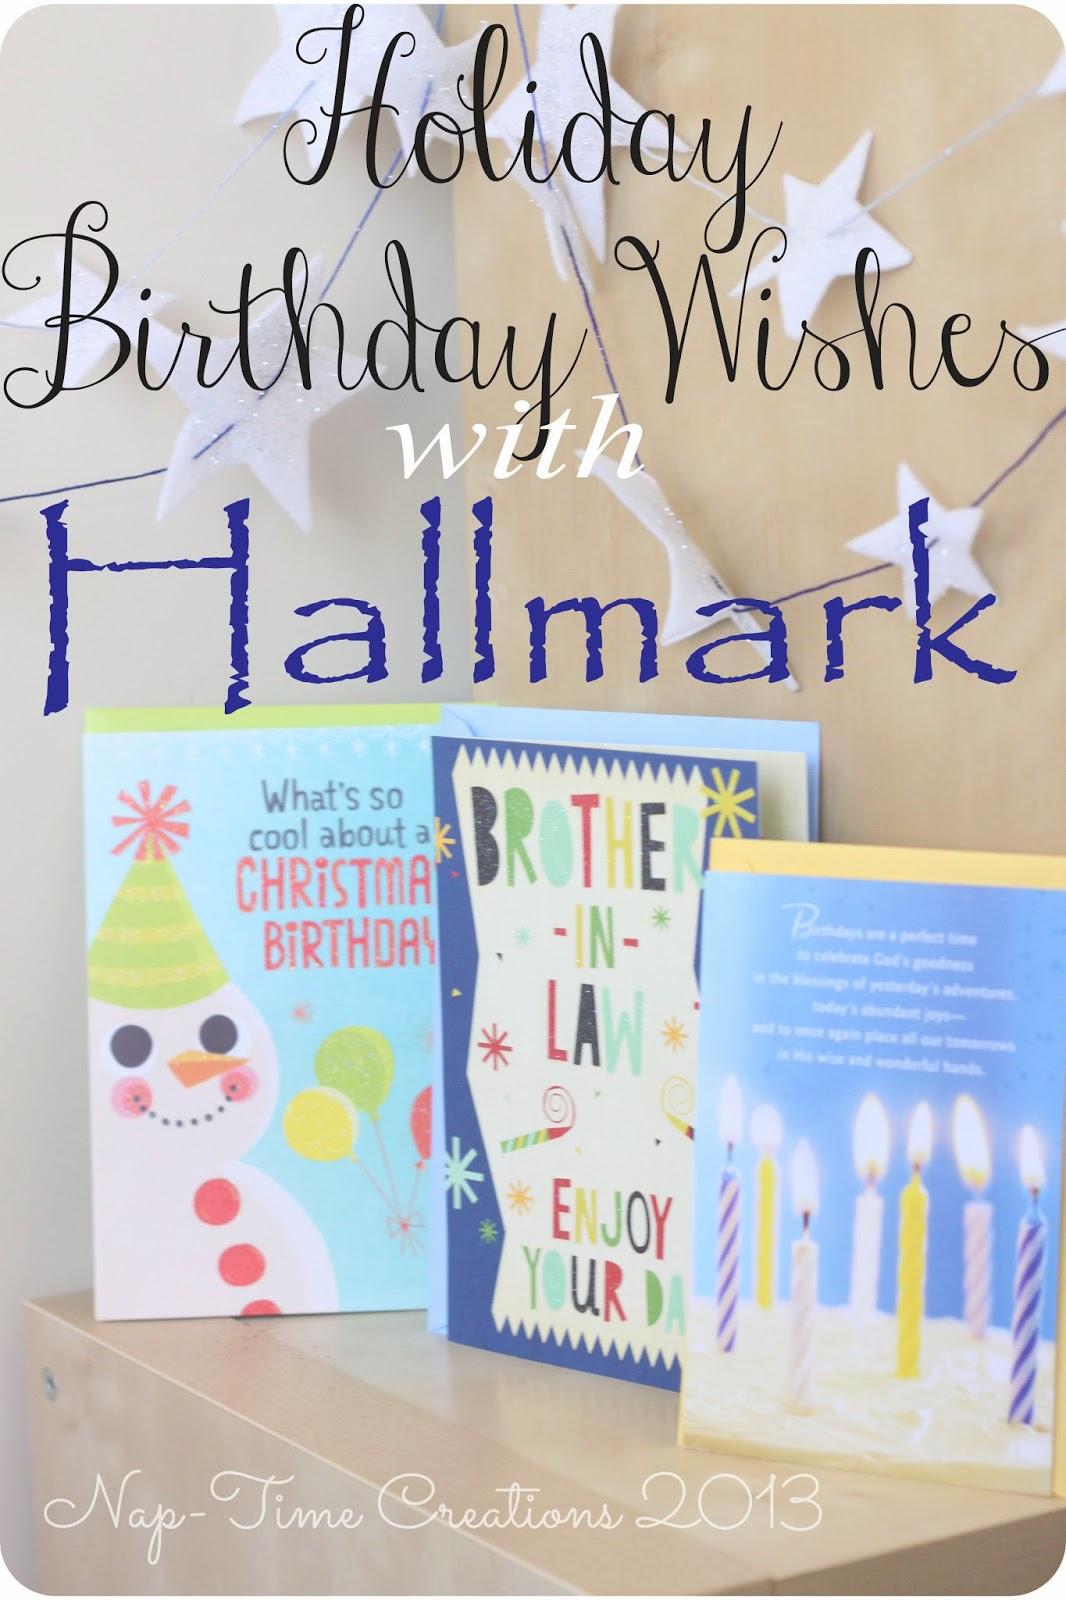 Holiday Birthday Wishes From Hallmark Life Sew Savory